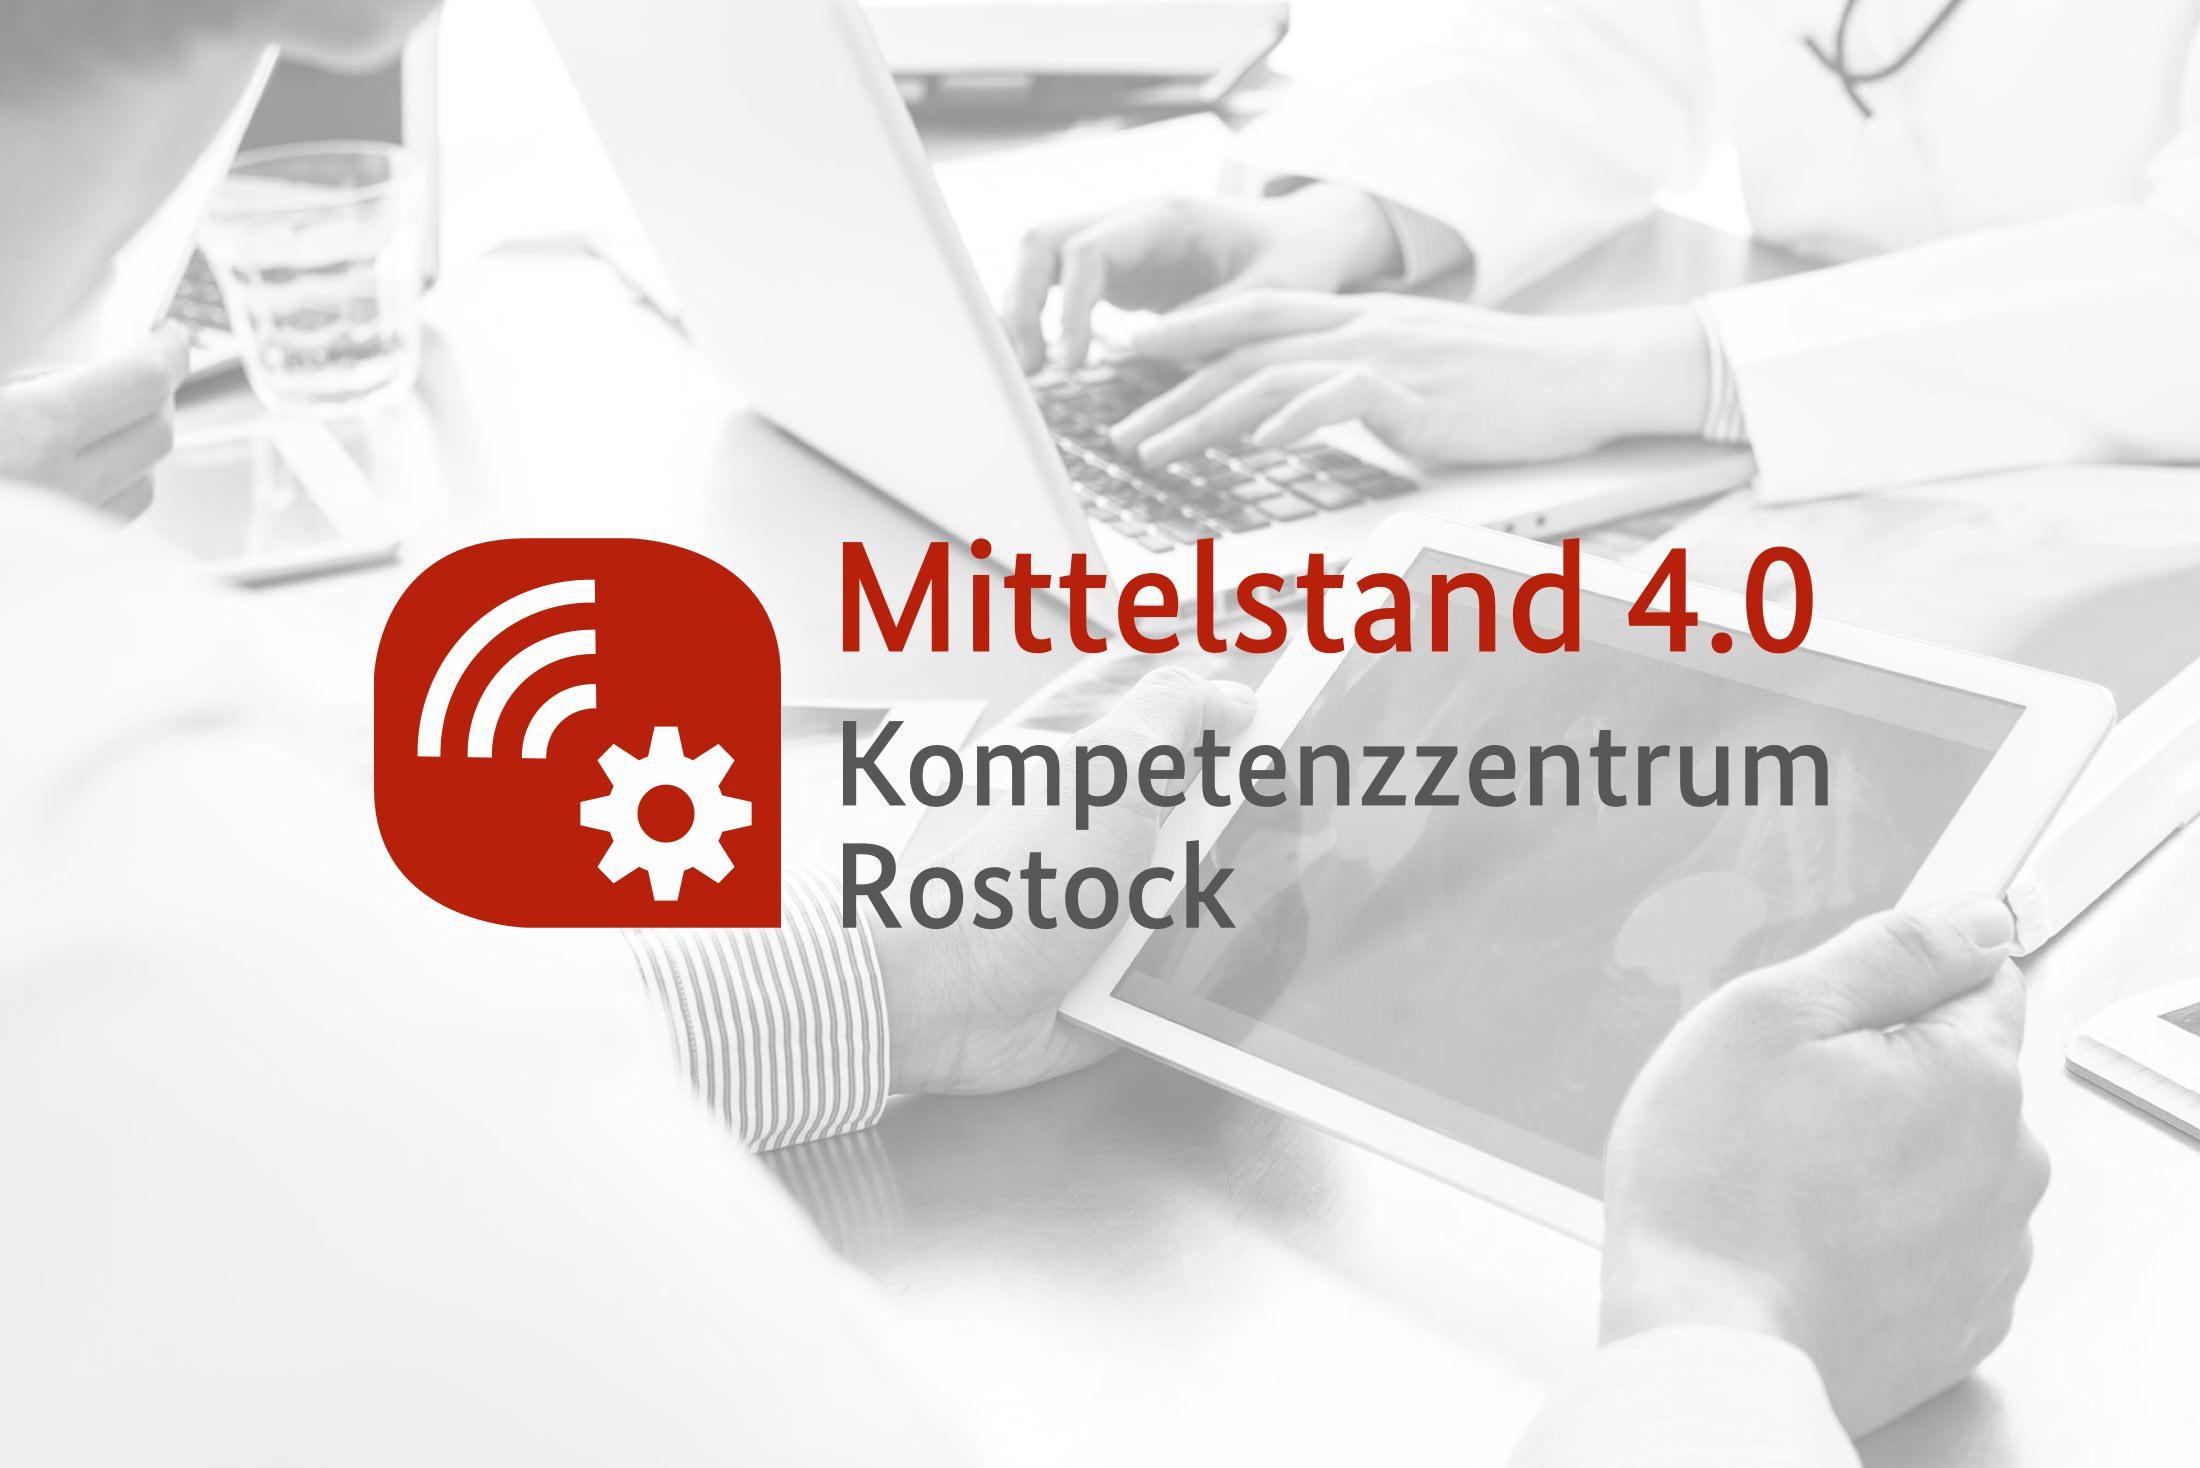 Mittelstand 4.0 – Kompetenzzentrum Rostock » IT Initiative Mecklenburg-Vorpommern e.V.